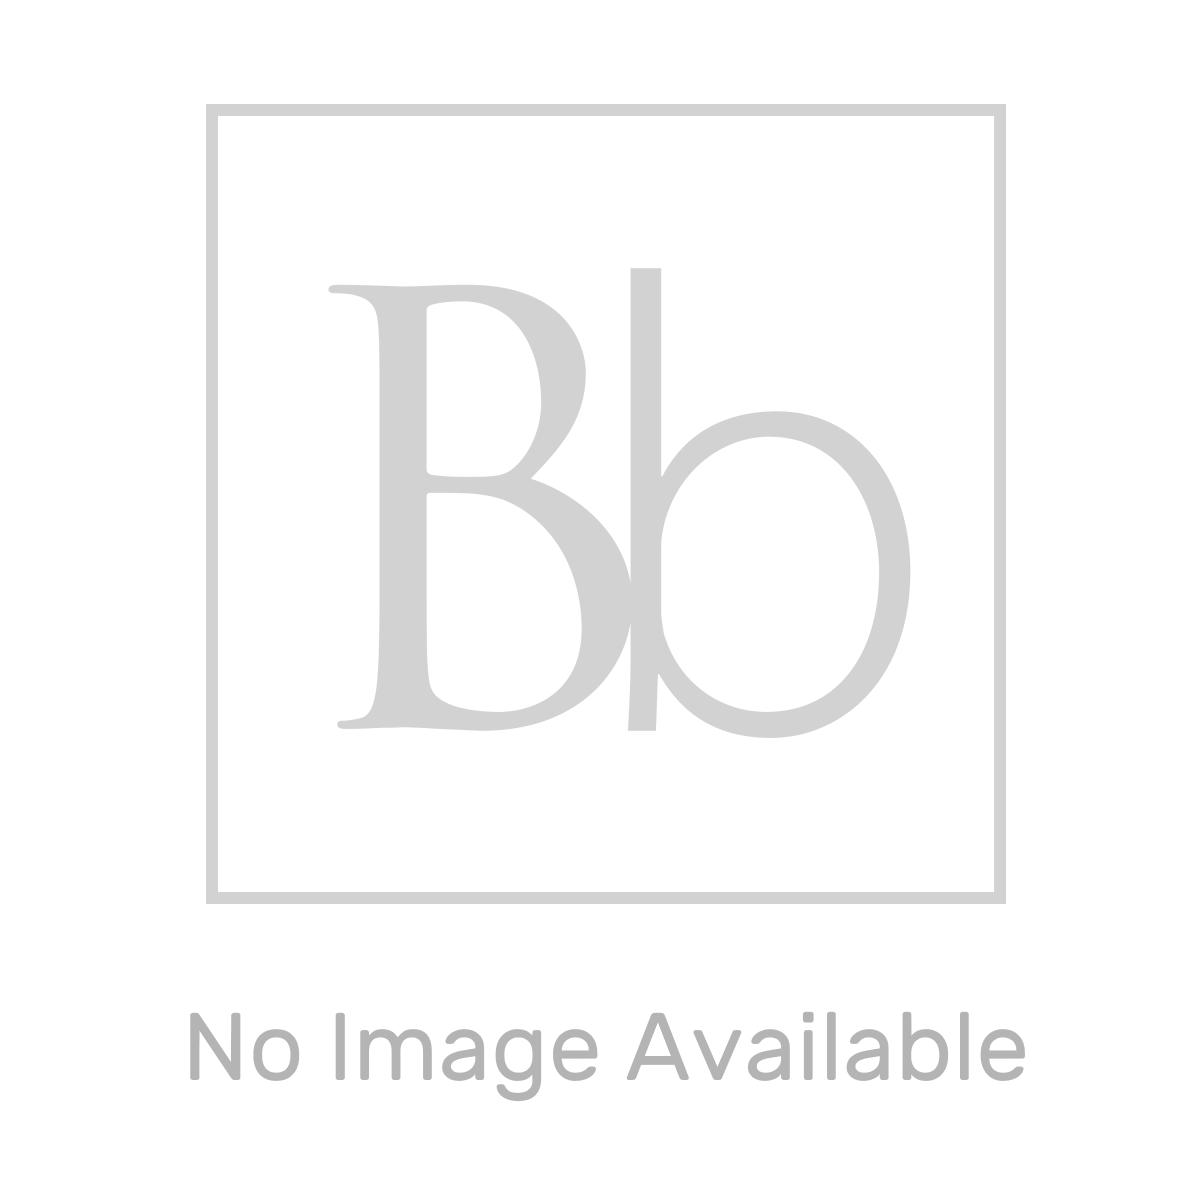 Elation Eko White Gloss Mirror Wall Unit 750mm Measurements